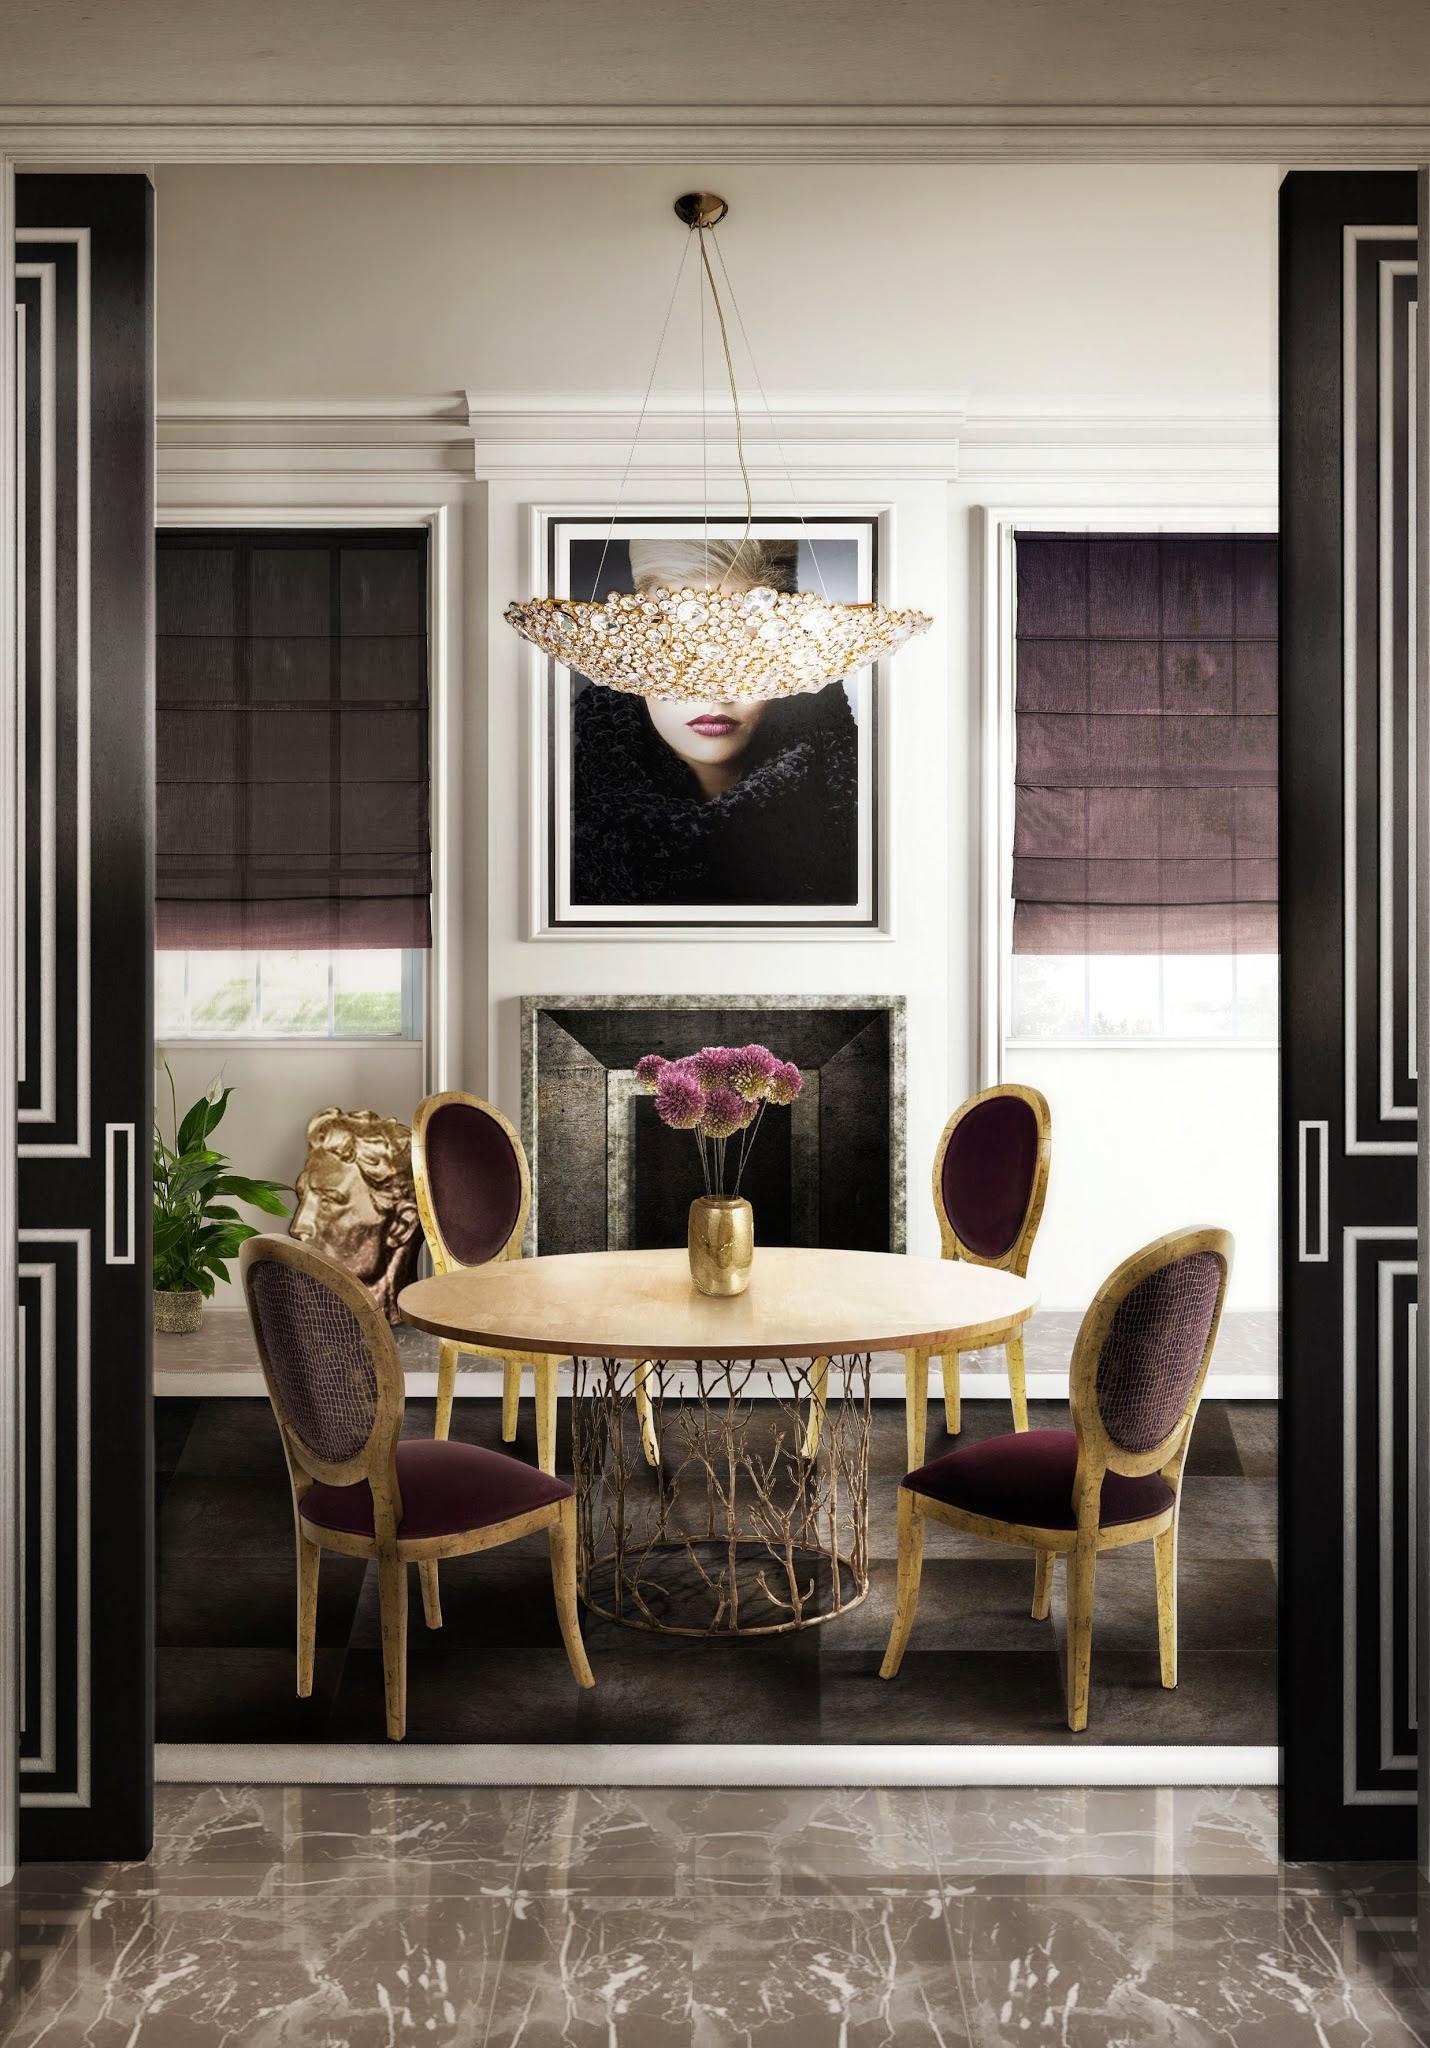 Current Interior Design Trends | Home Design Inspiration